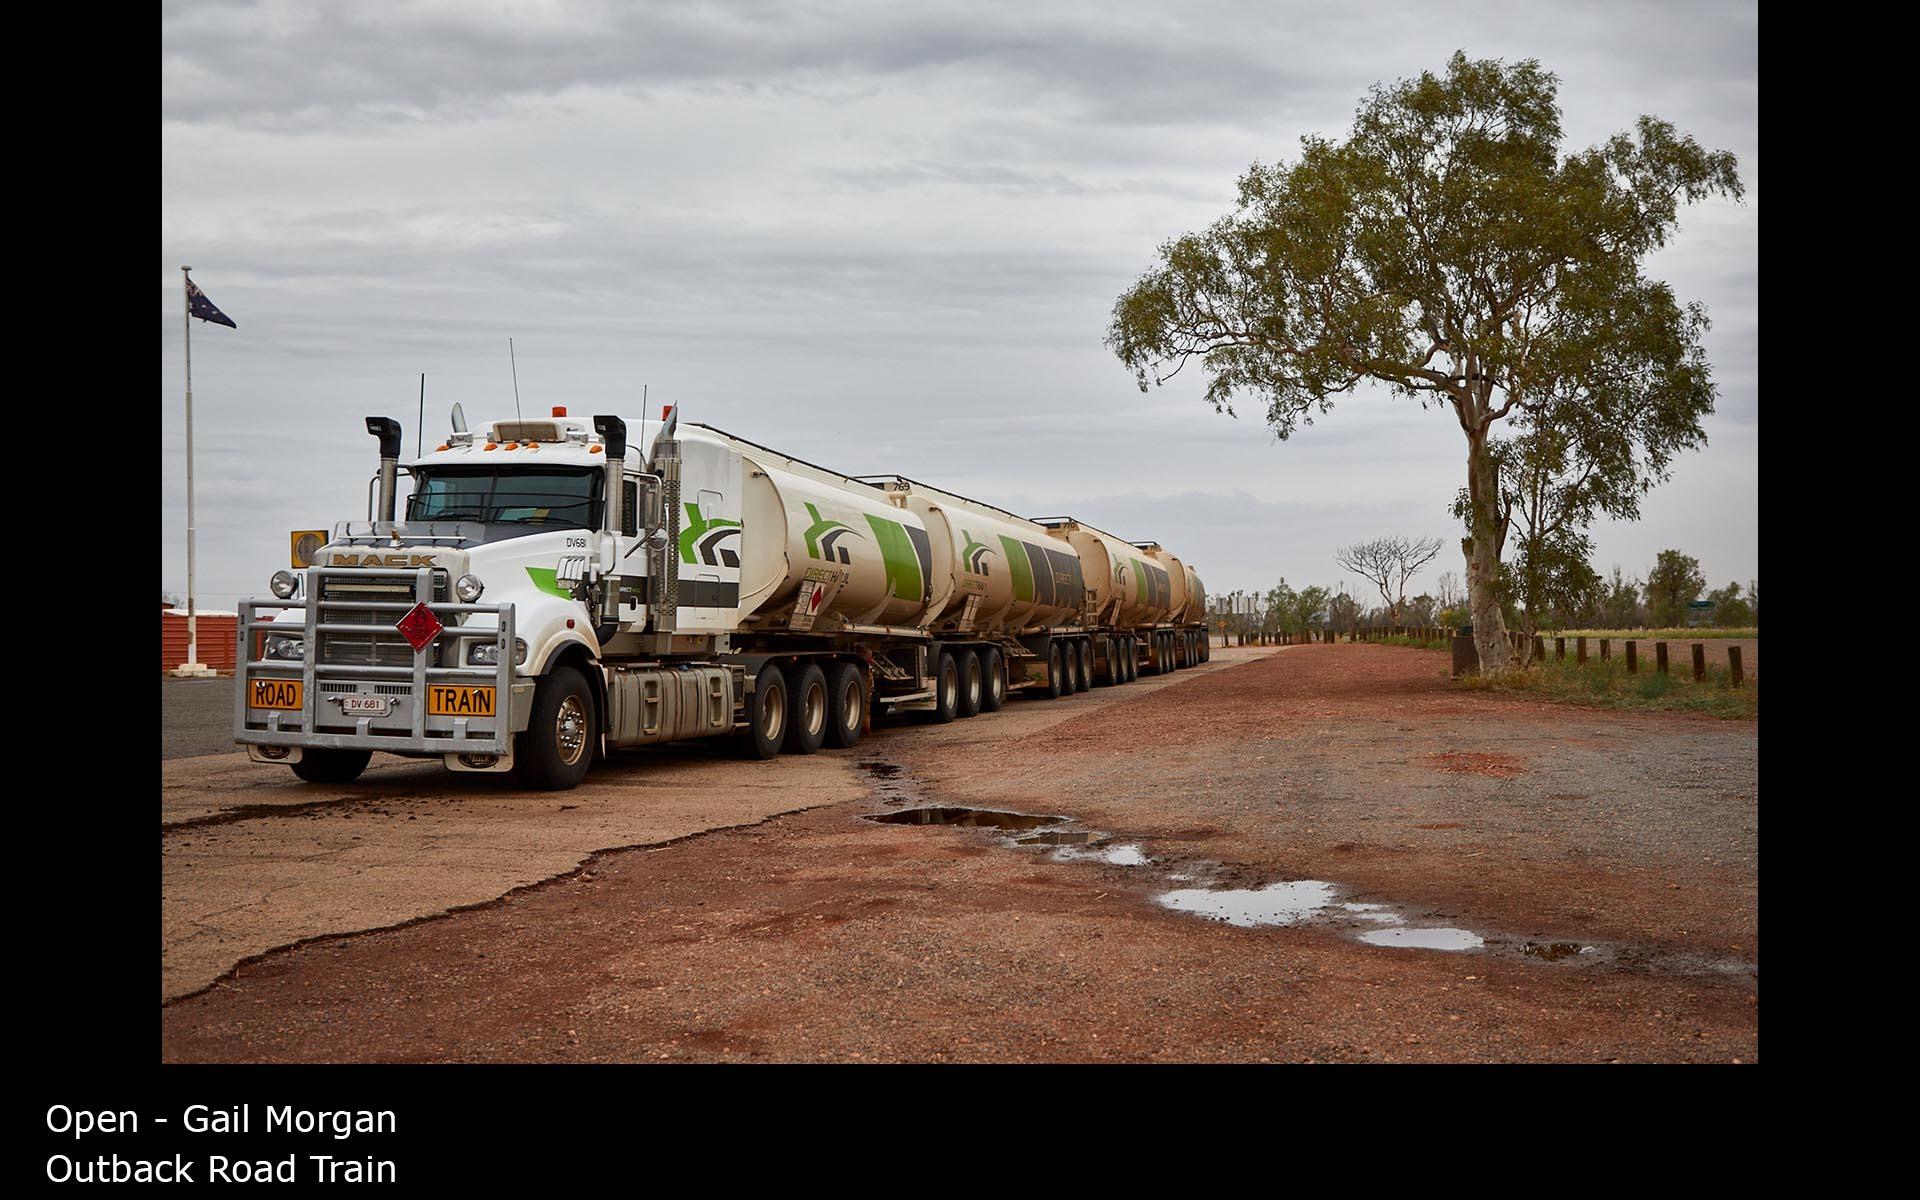 Outback Road Train - Gail Morgan